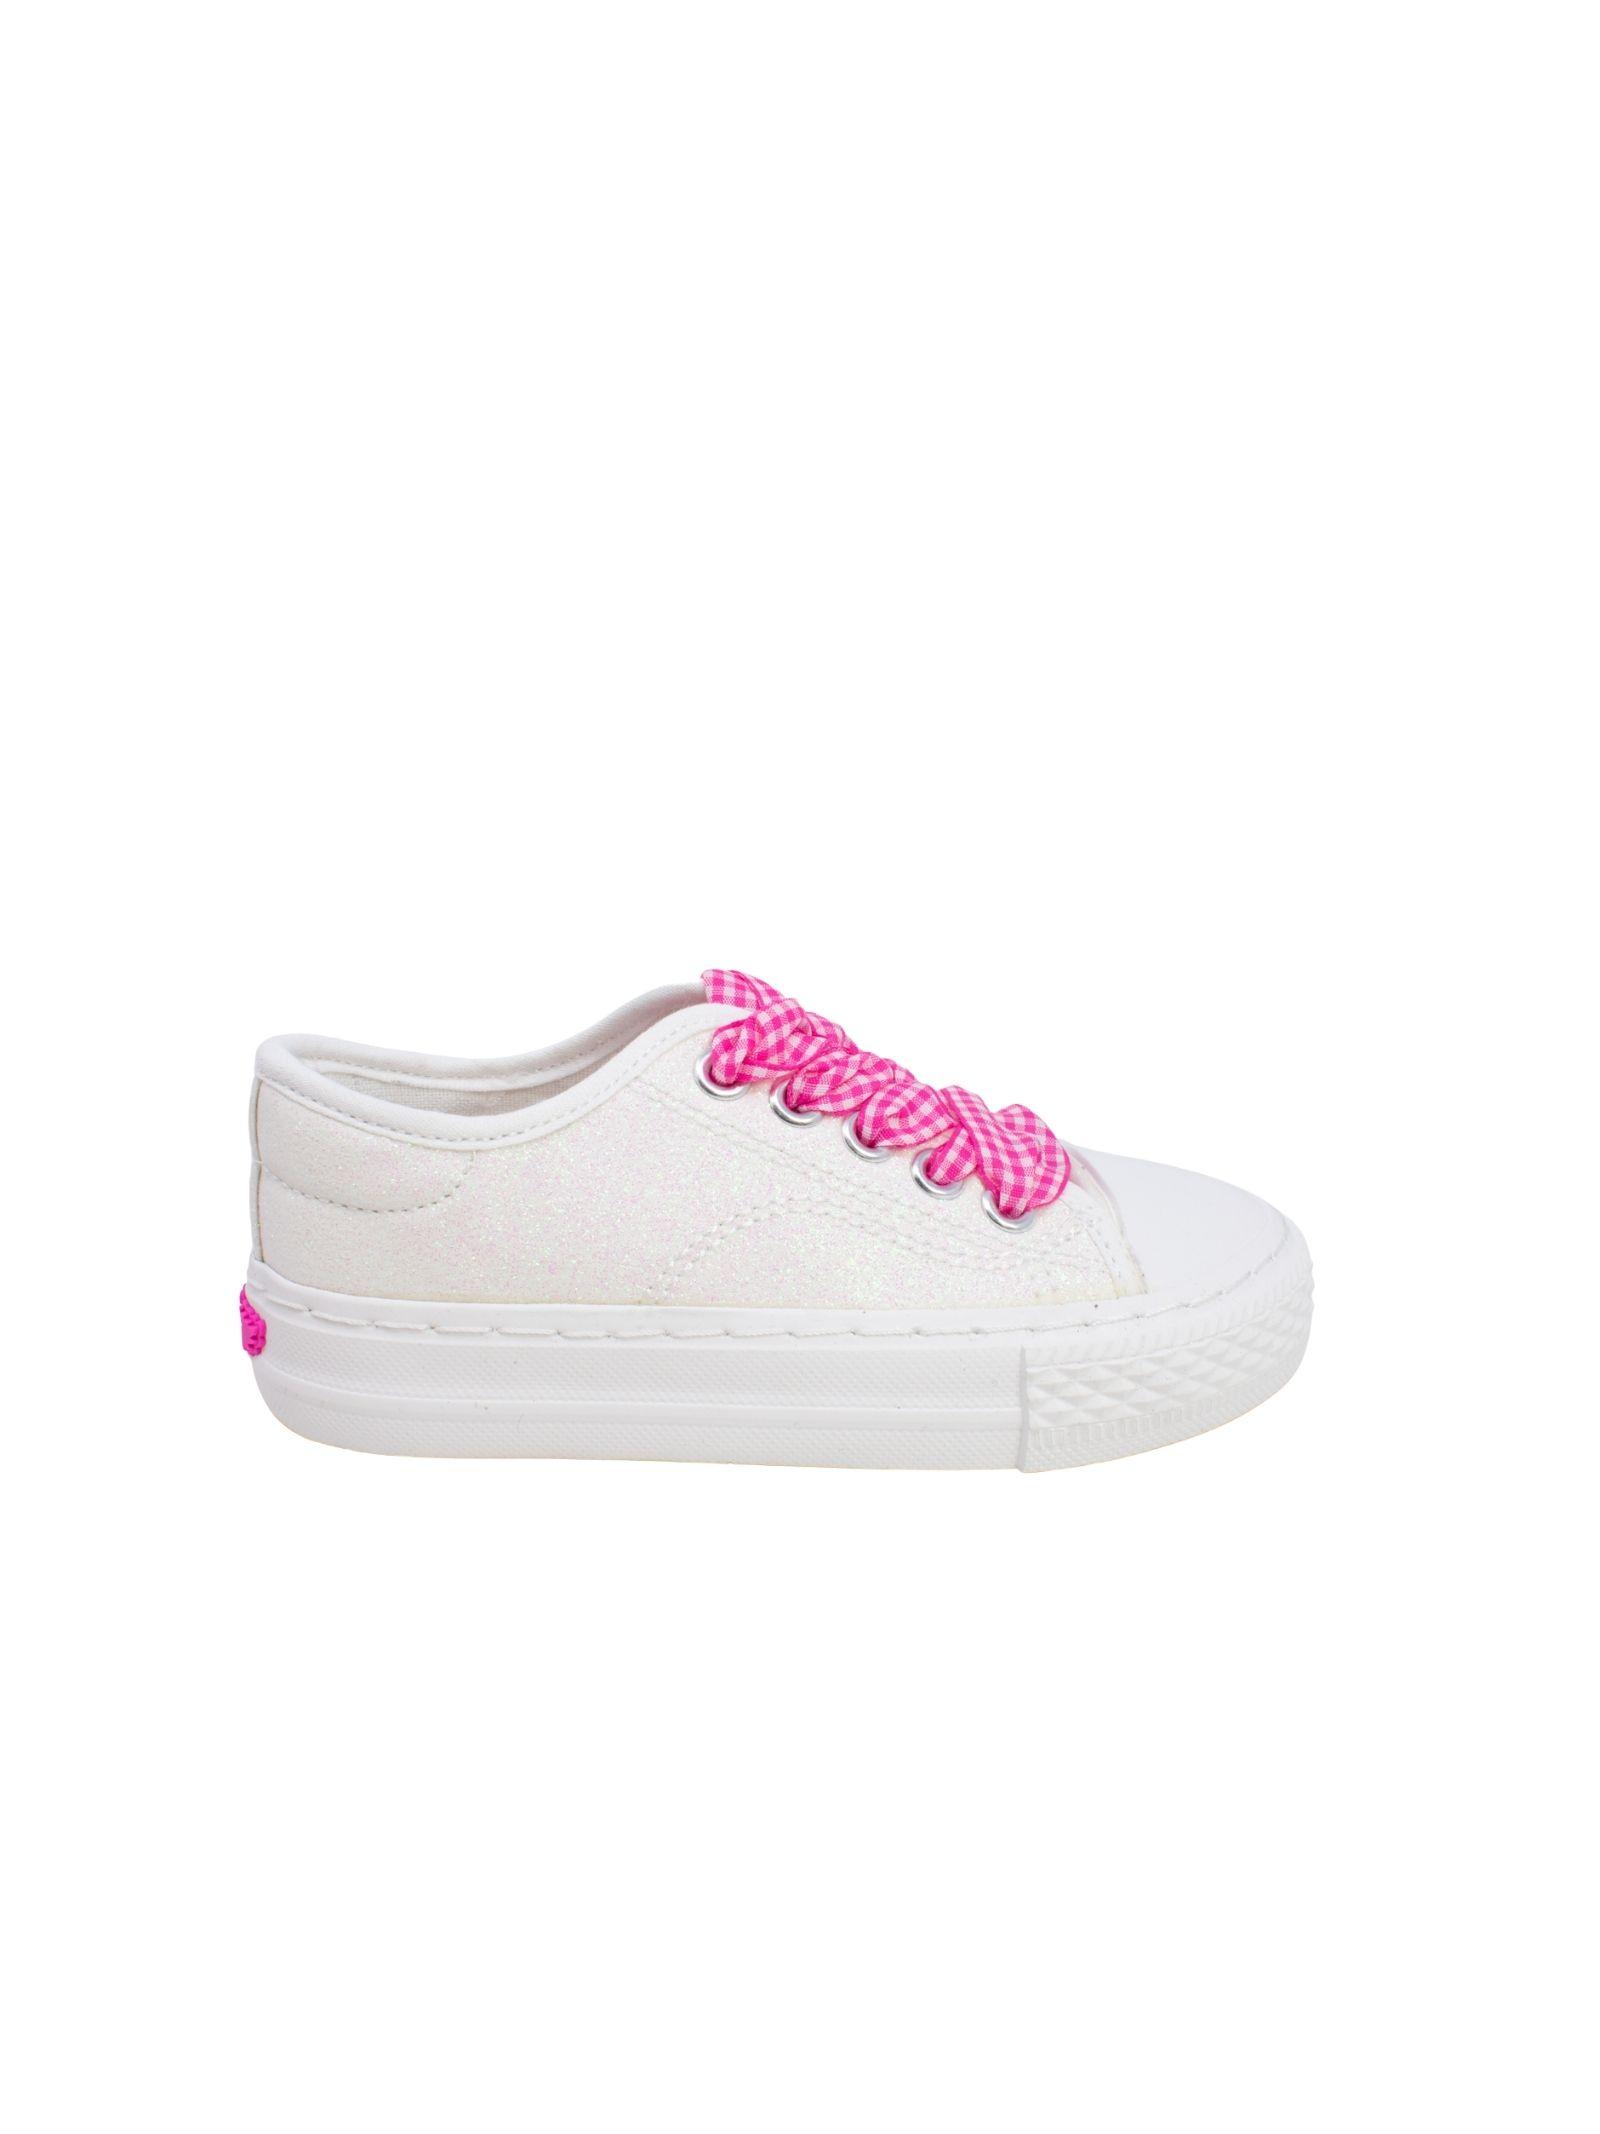 Sneakers Gaia LELLI KELLY | Sneakers | LK1326BIANCO